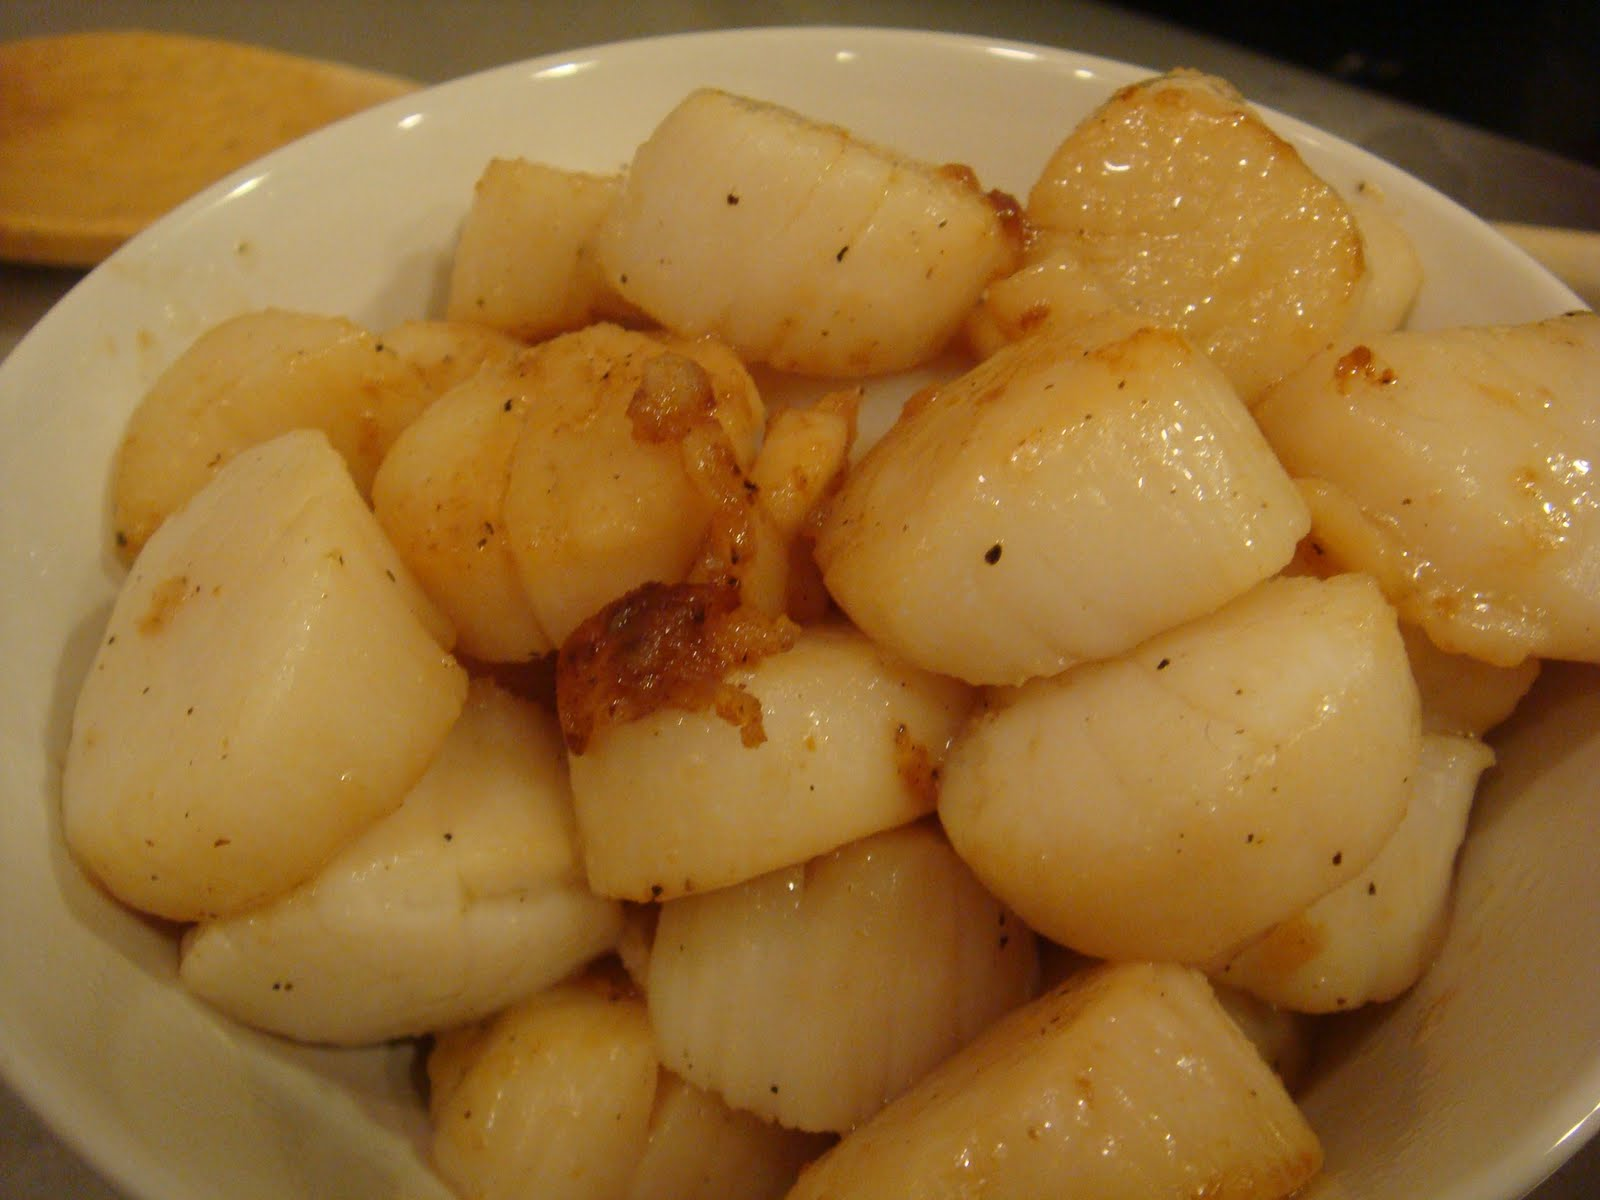 Gourmet Gibbs: Scallops, Garden Peppers and Pasta